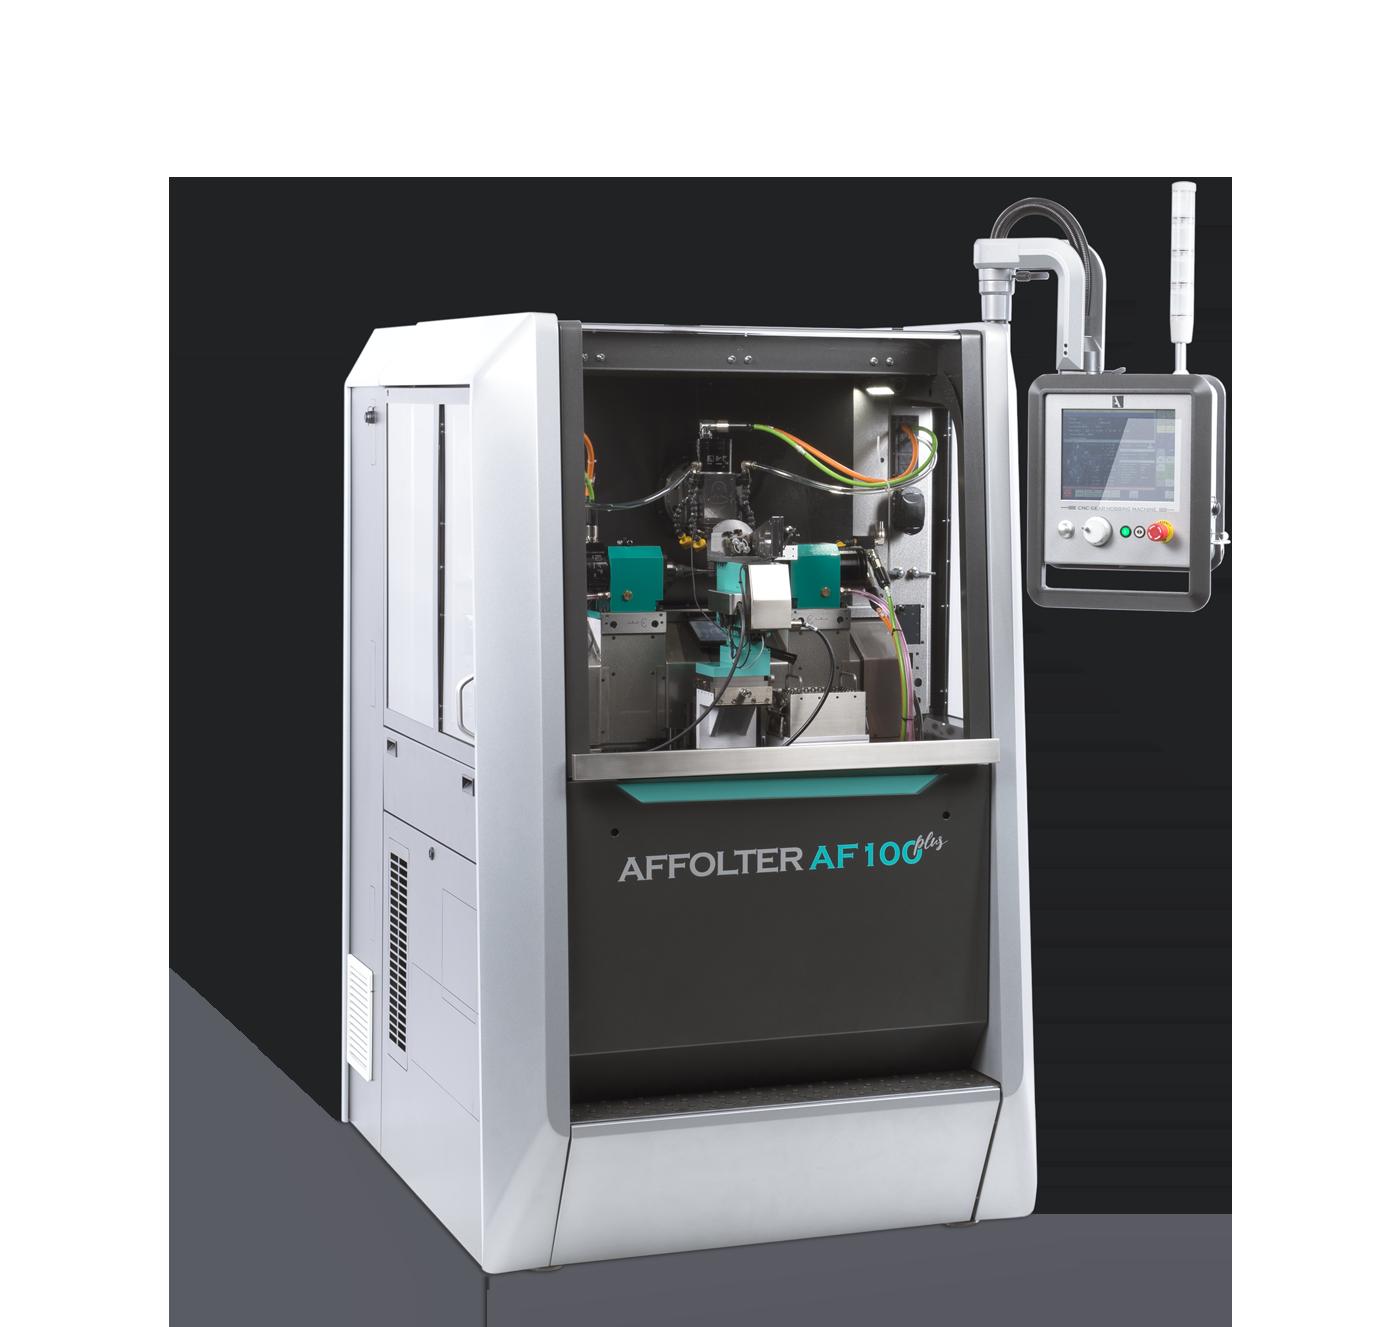 Affolter AF100 plus - versatile CNC Gear Hobbing Machine